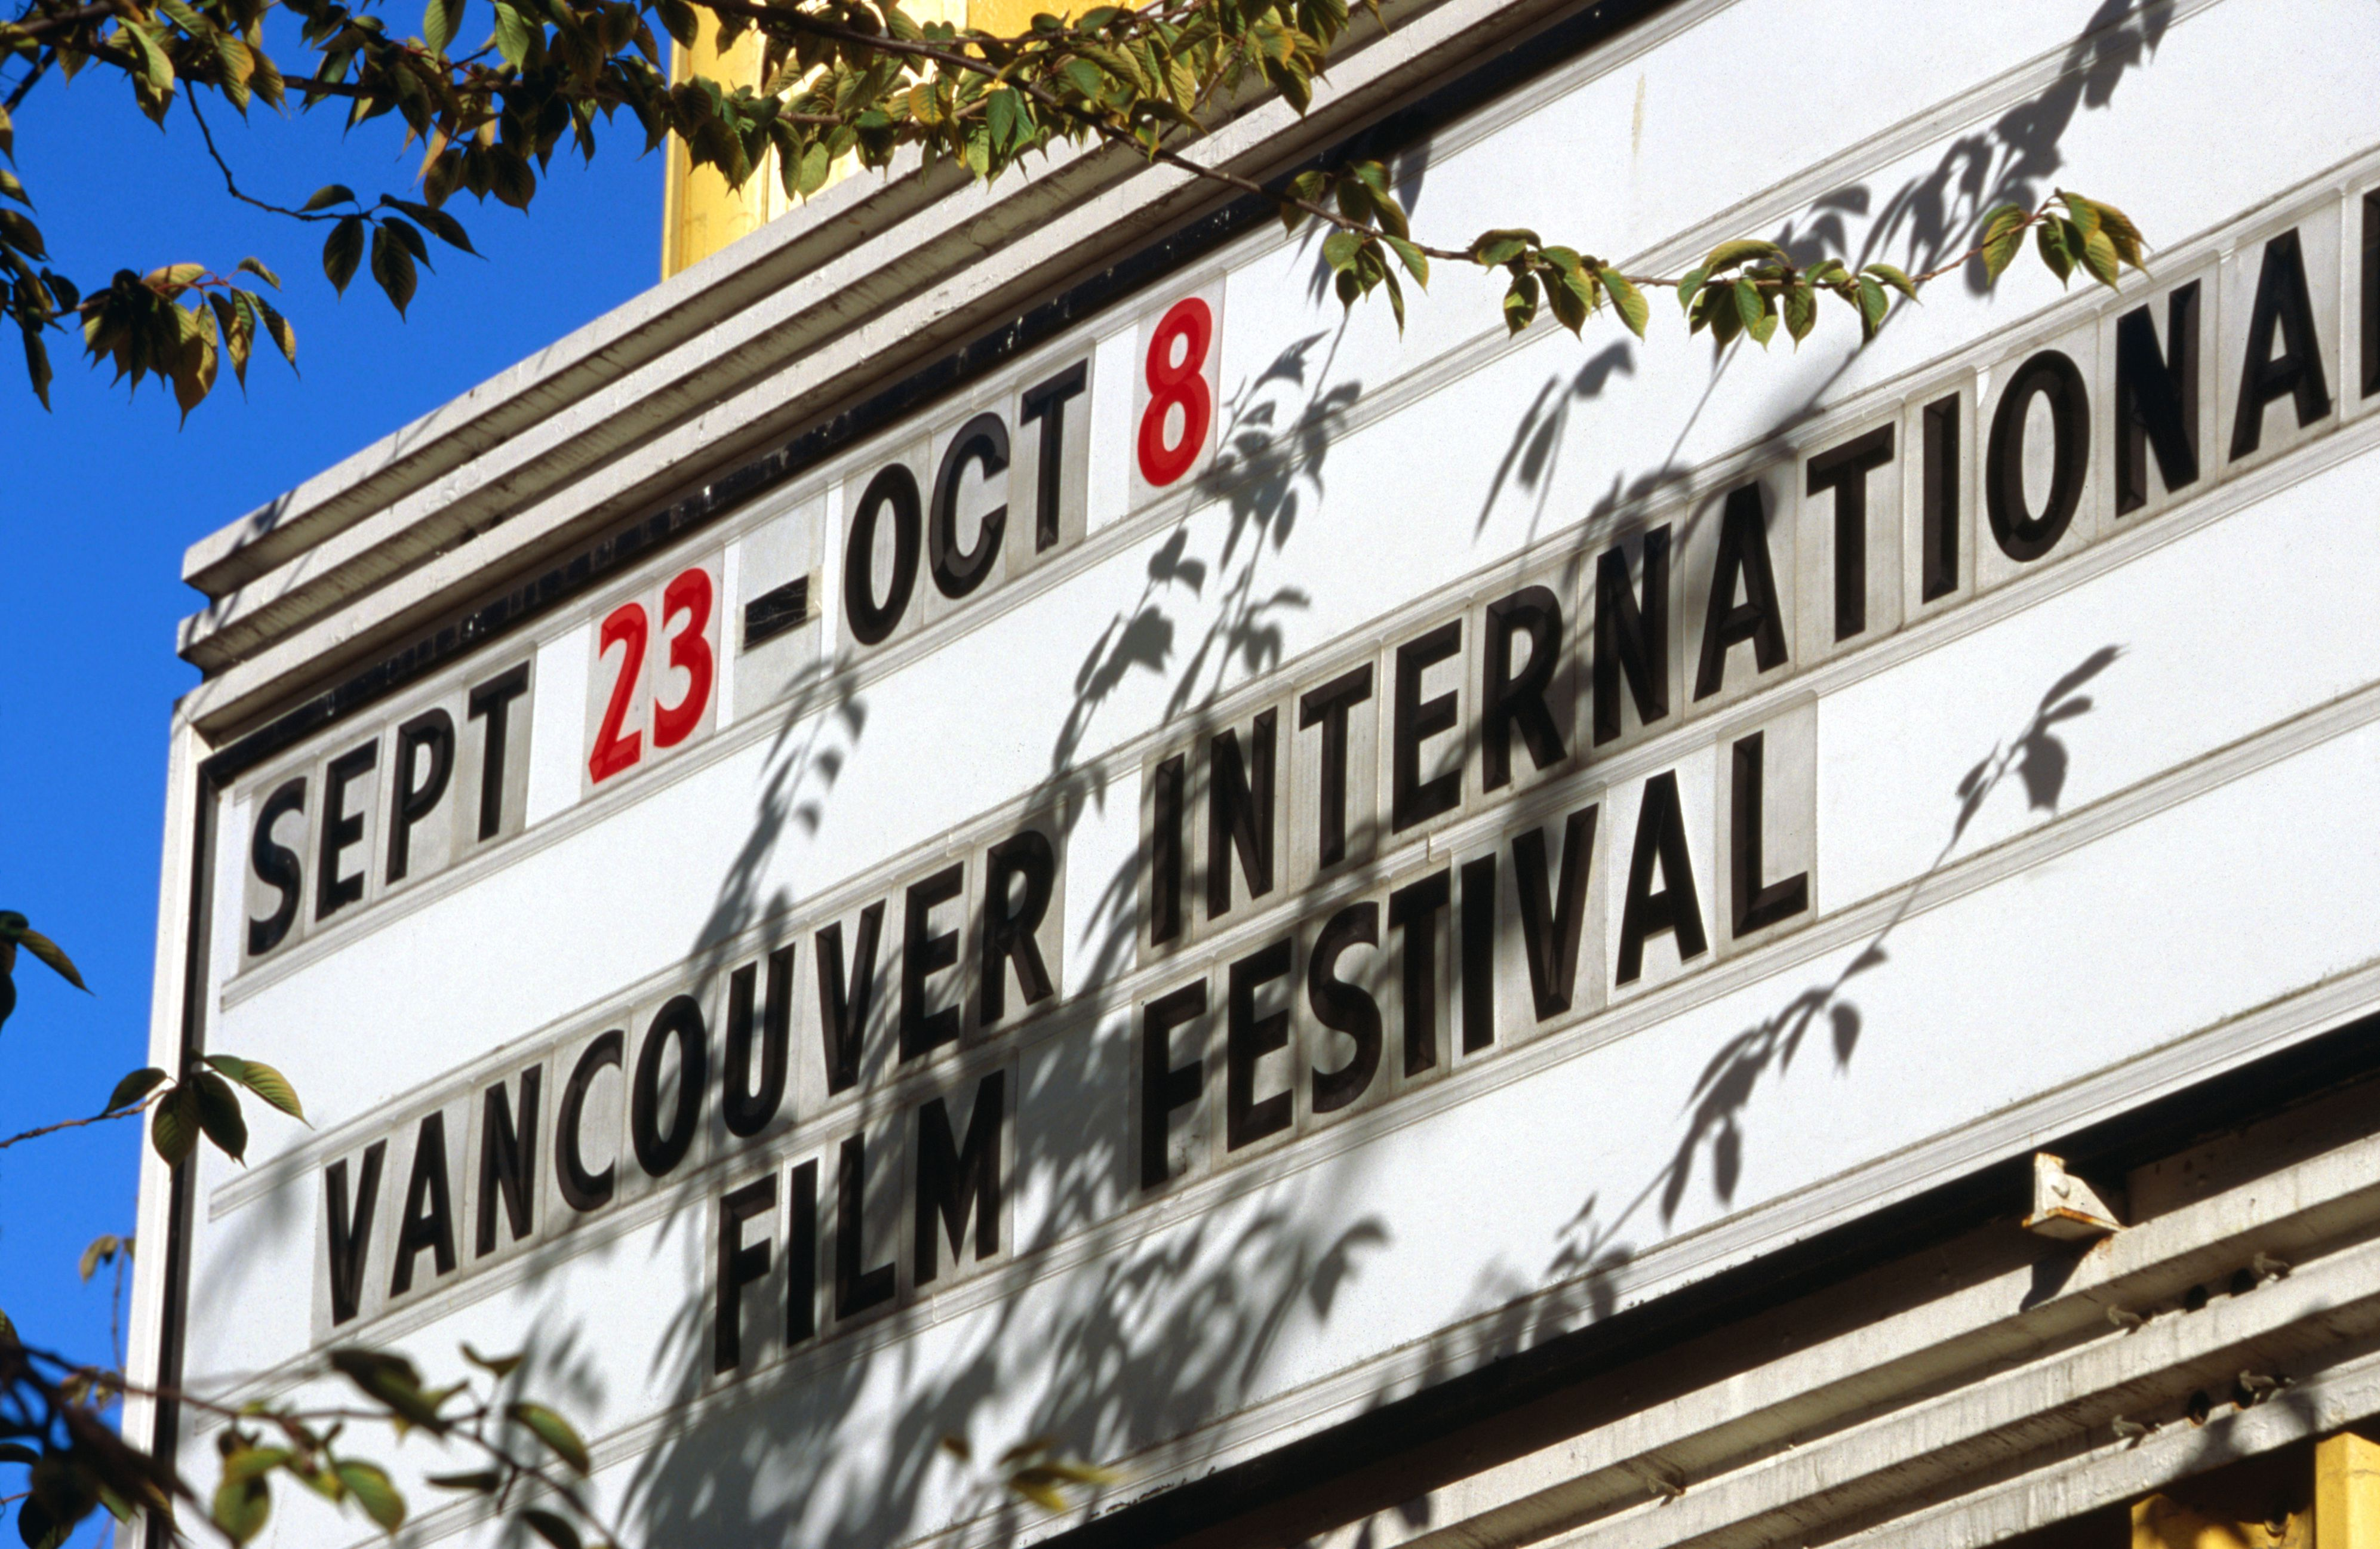 Sign for Vancouver International Film Festival.